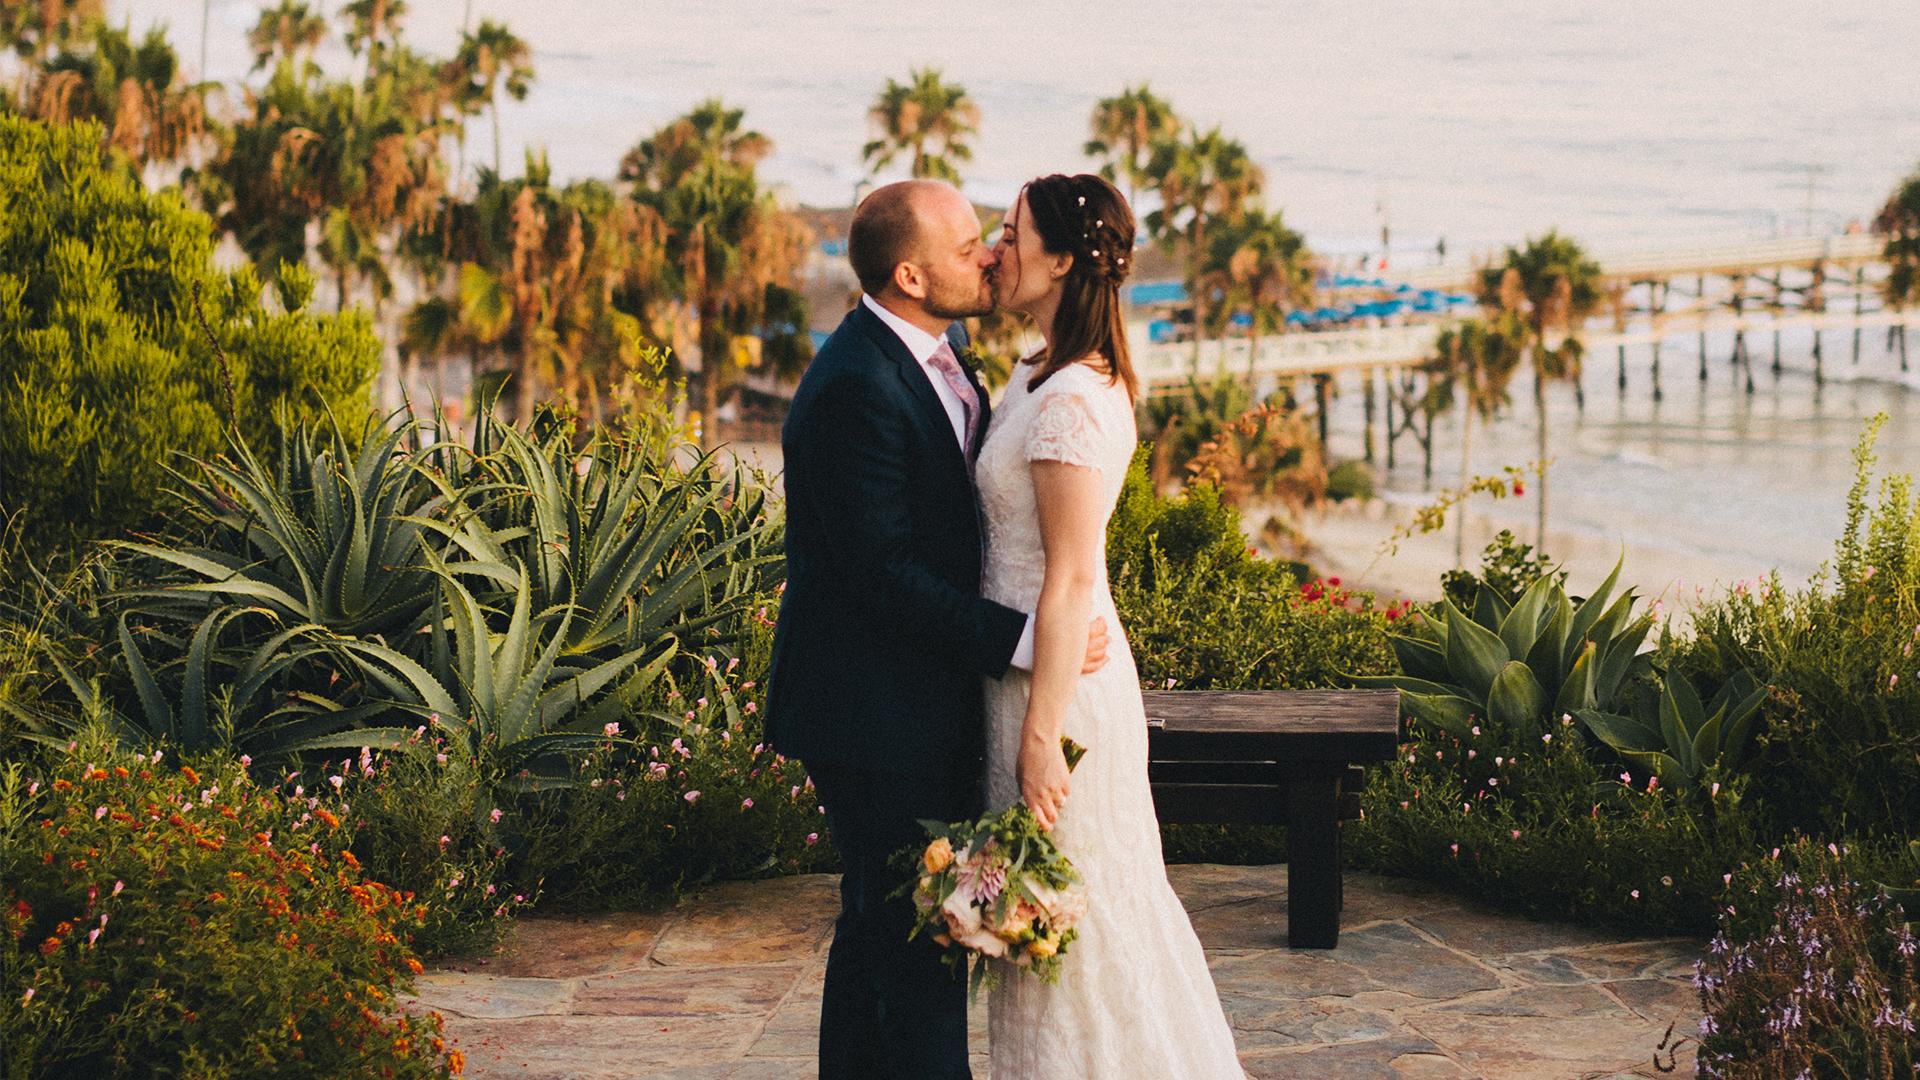 Vanessa + Niklas | San Clemente, California | Casa Romantica